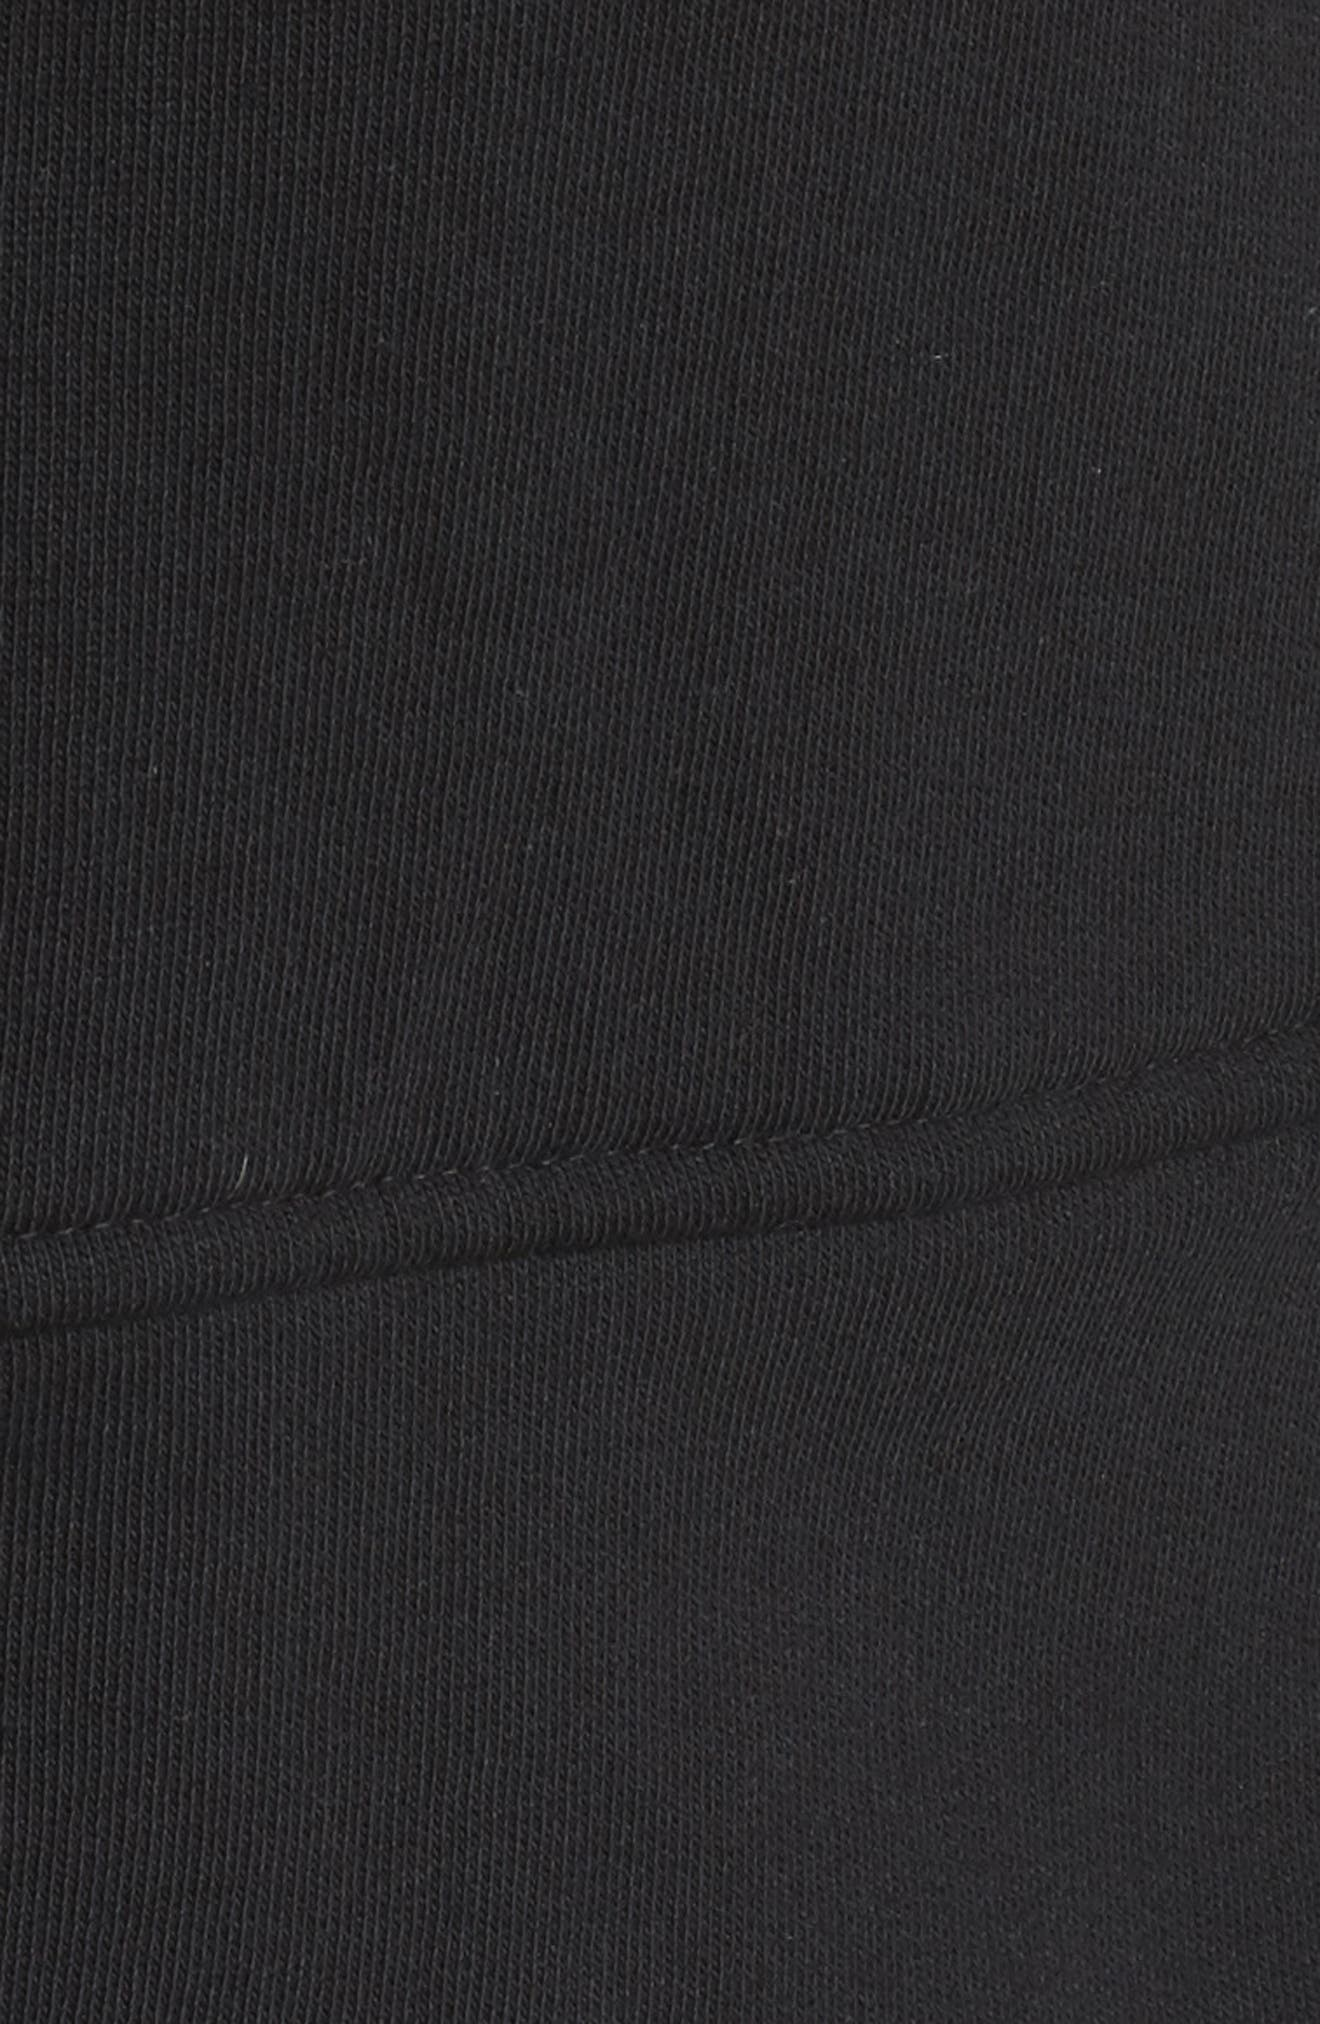 Knit Peplum Jacket,                             Alternate thumbnail 6, color,                             Black